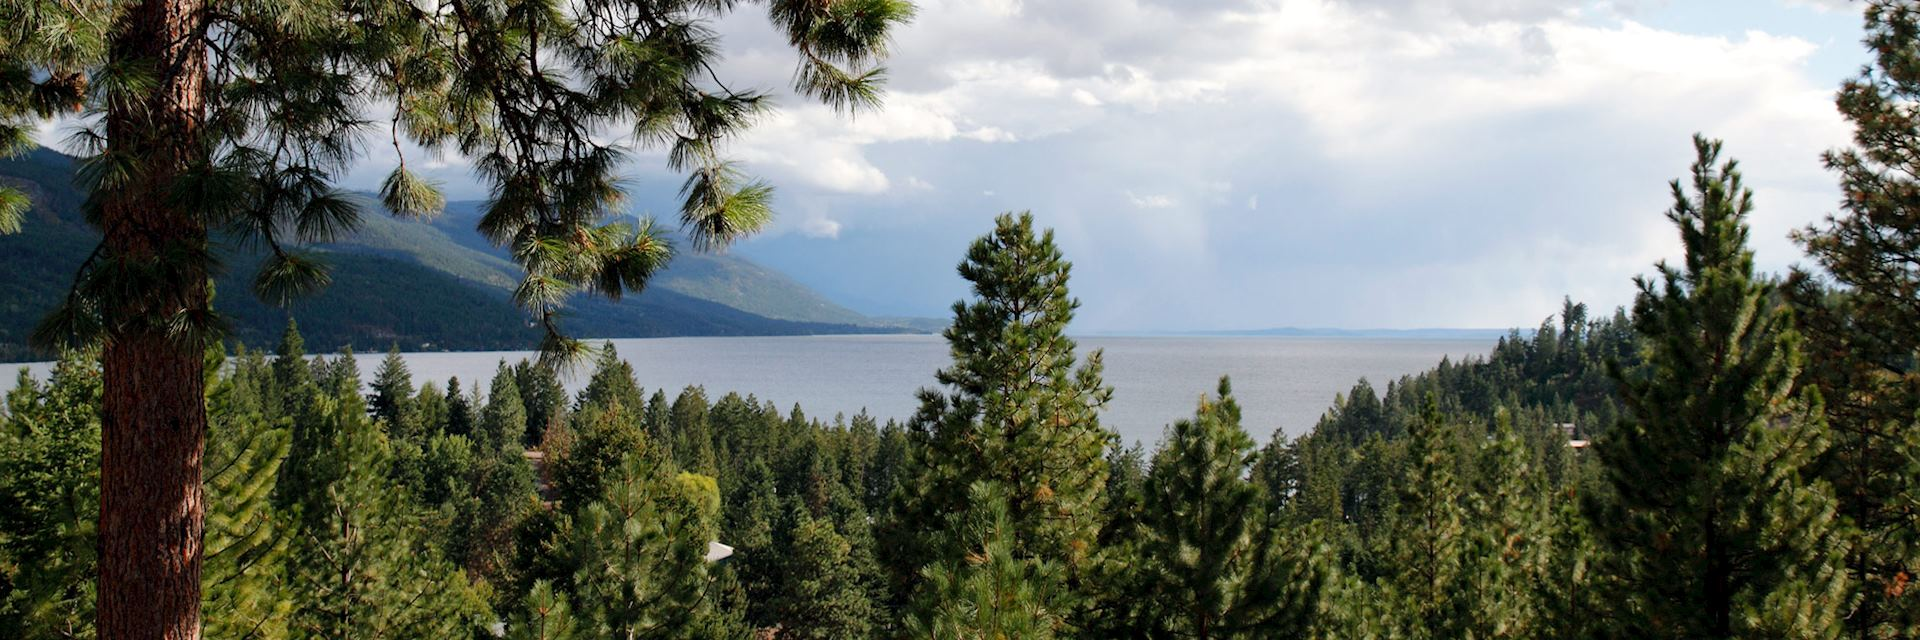 Flathead Lake near Kalispell, the USA